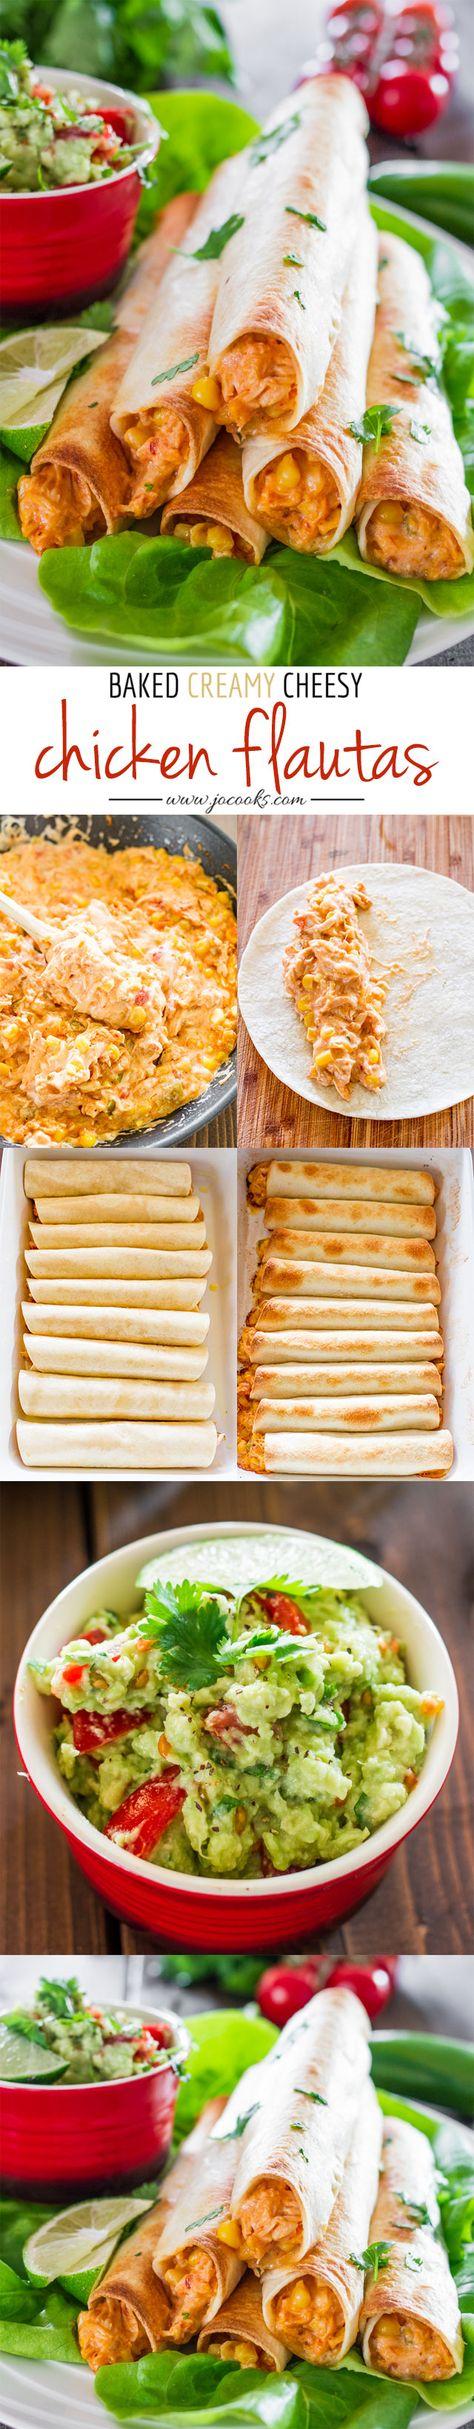 Baked creamy cheese chicken flautas